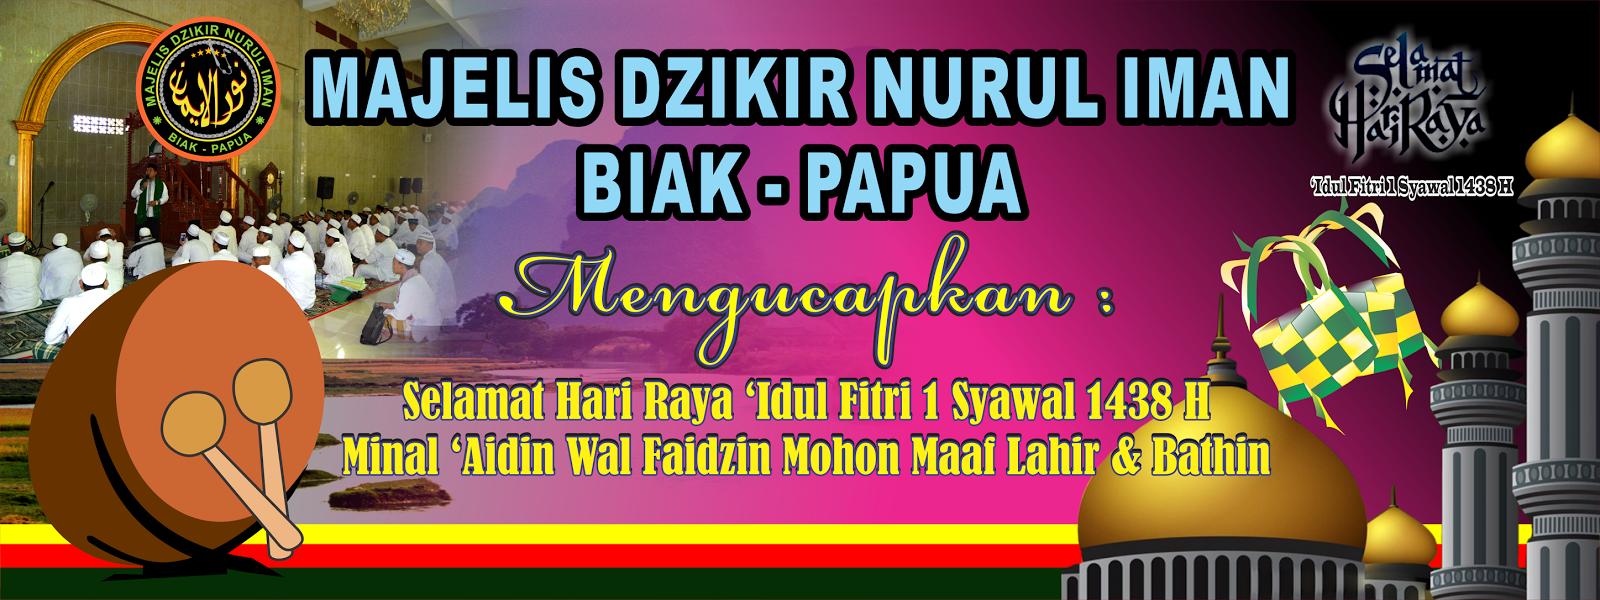 Spanduk Idul Fitri Terbaru Cdr Free Download